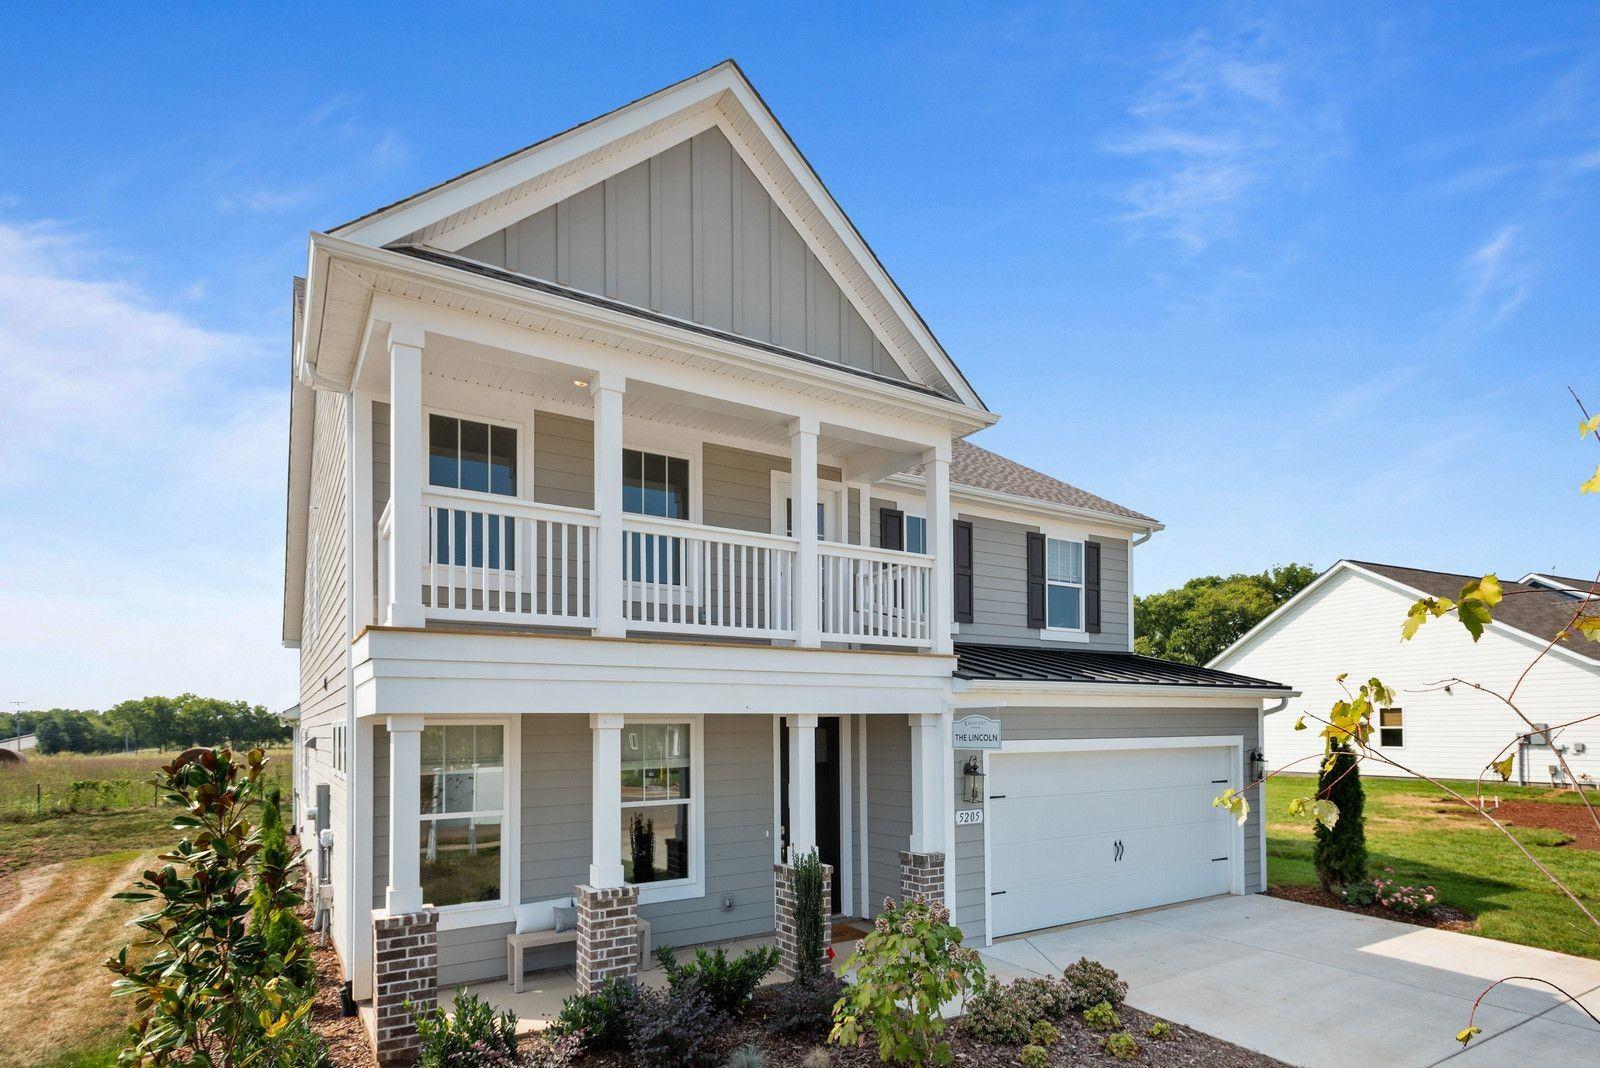 5342 Pointer Place Lot 22, Murfreesboro, TN 37129 - MLS#: 2205879